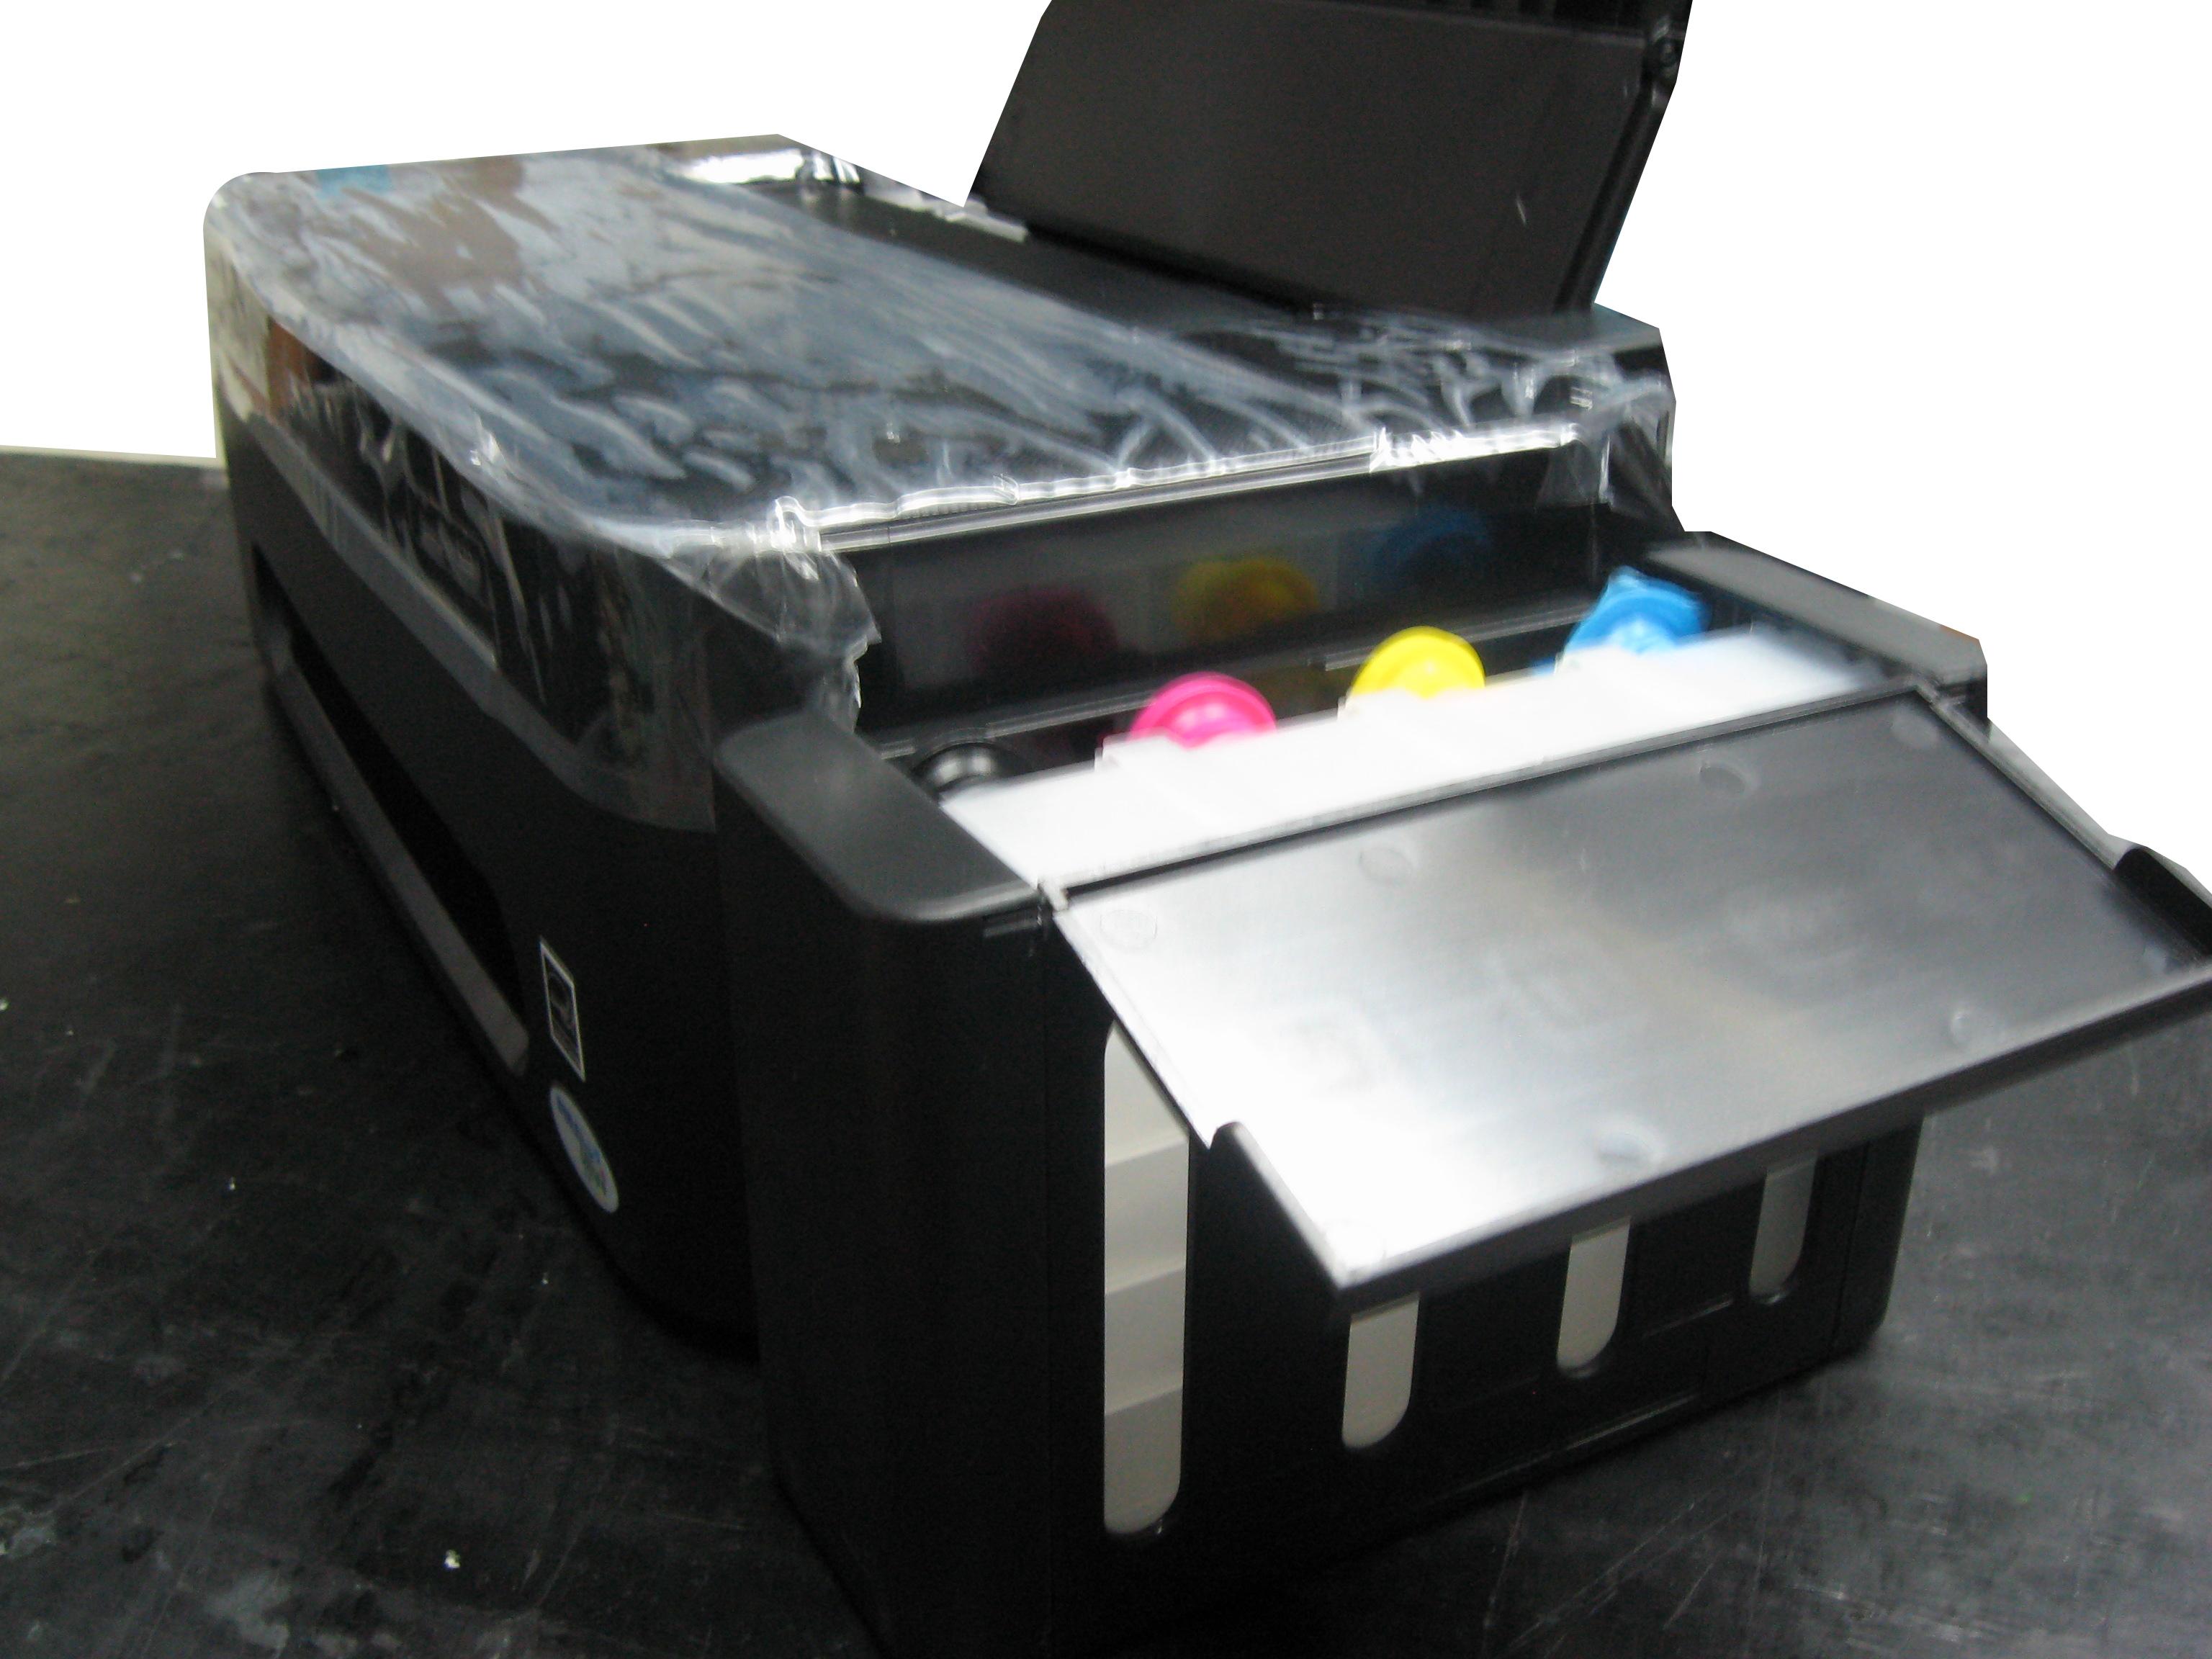 Brand New Epson Chipless Printer like L100